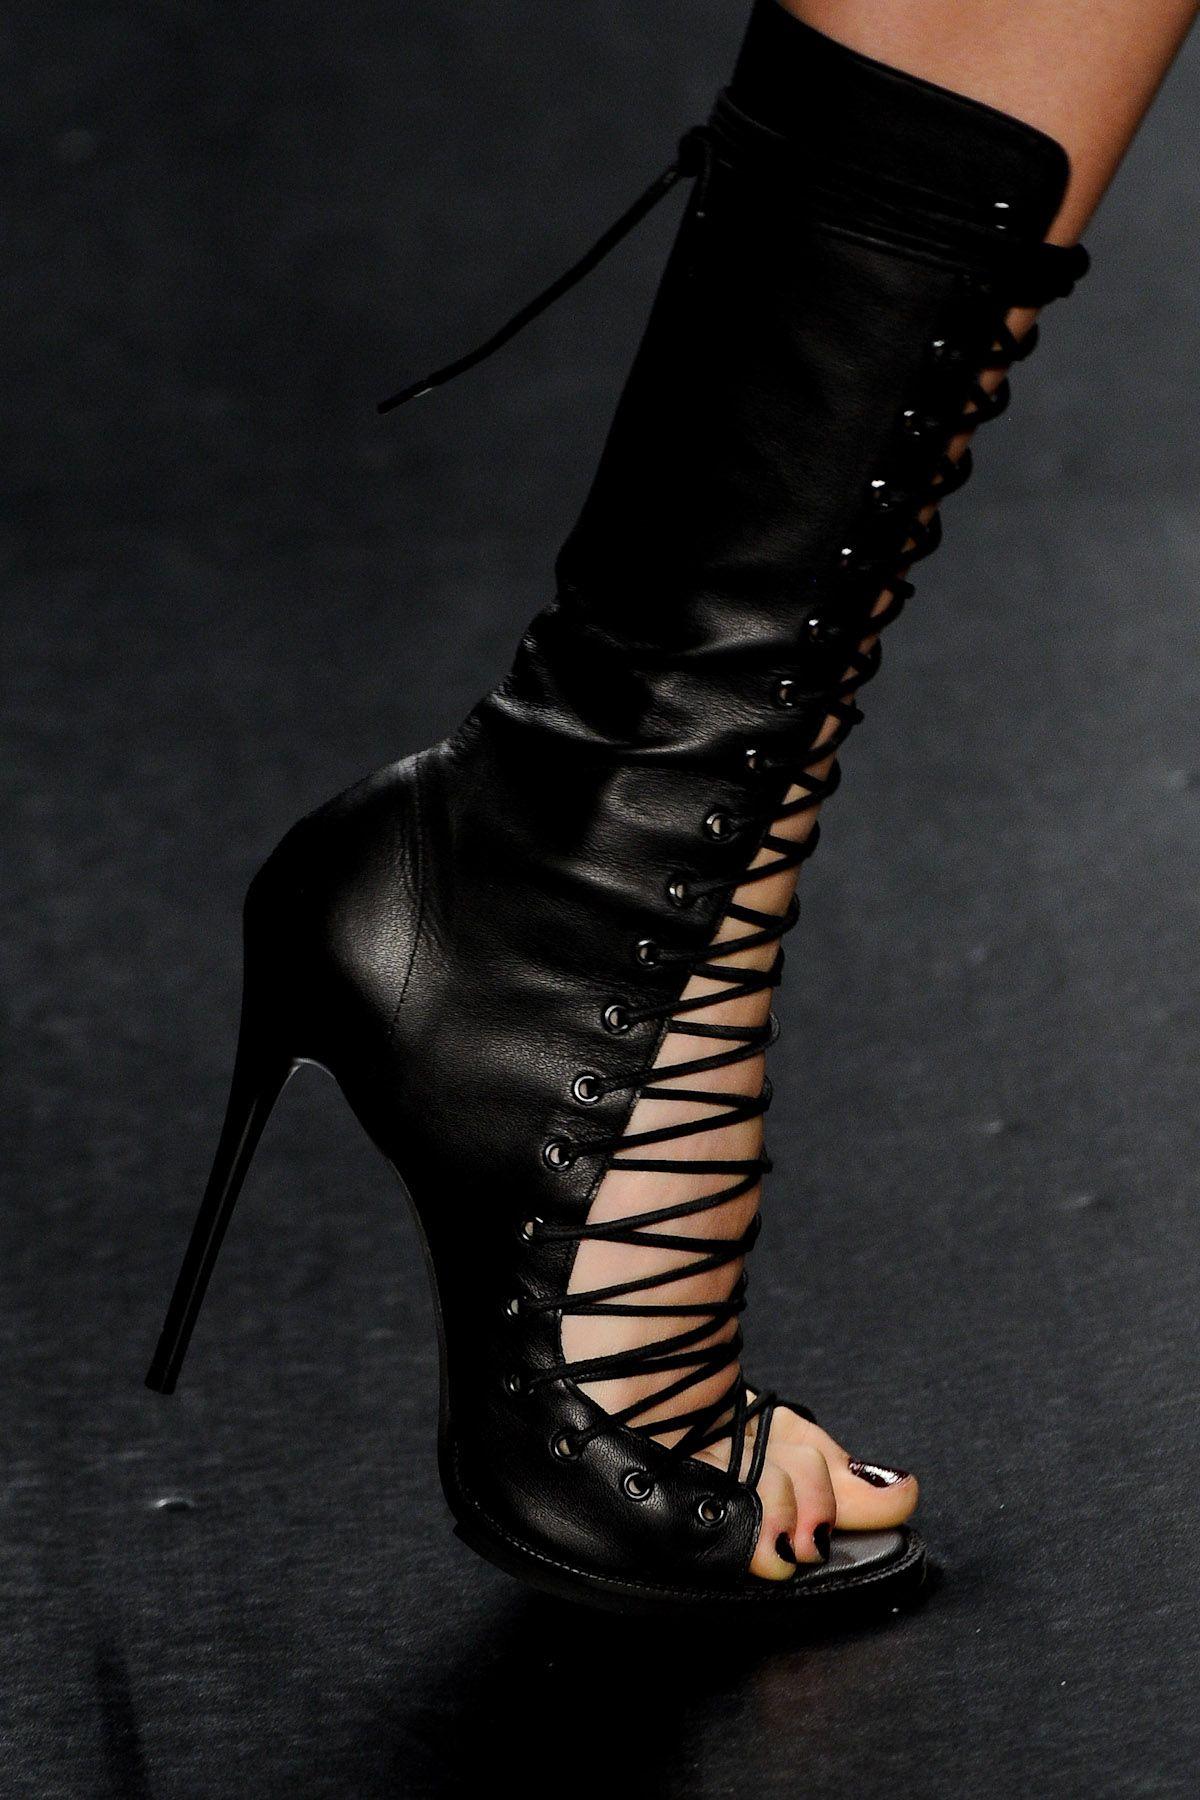 Tufi Duek lace up black leather open toe calf high heel sandals